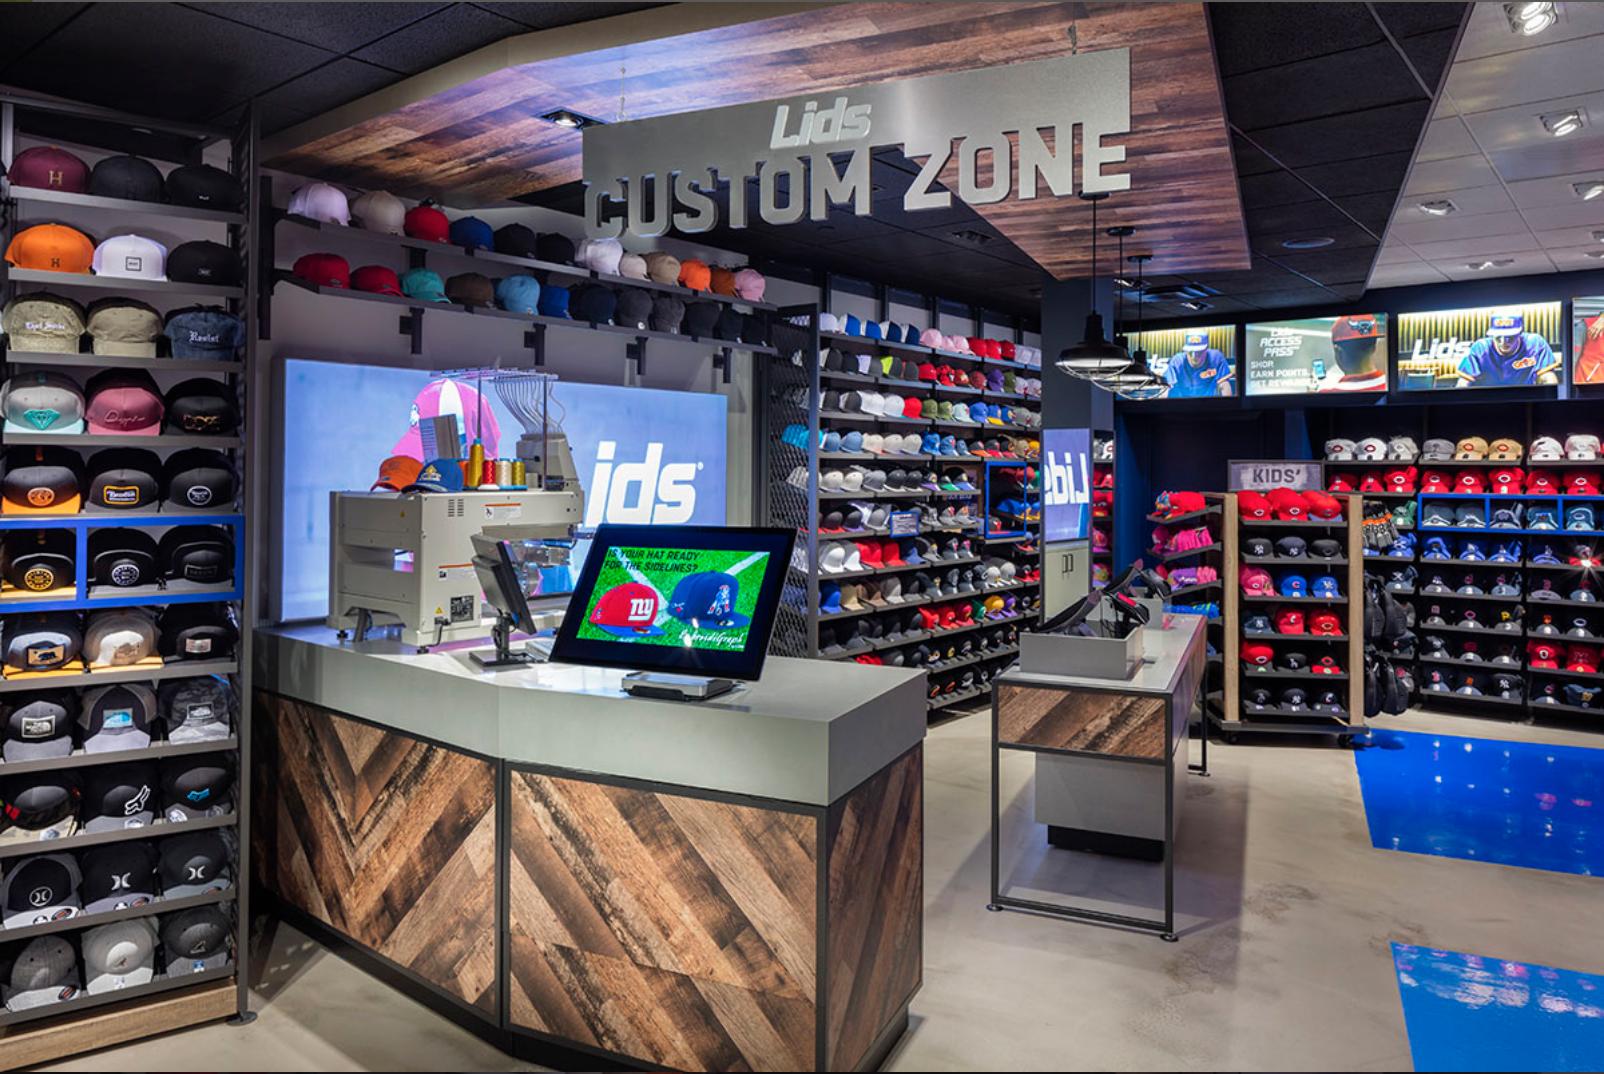 Lids Sports Group Retail Displays Retail Fixtures Retail Display Retail Design